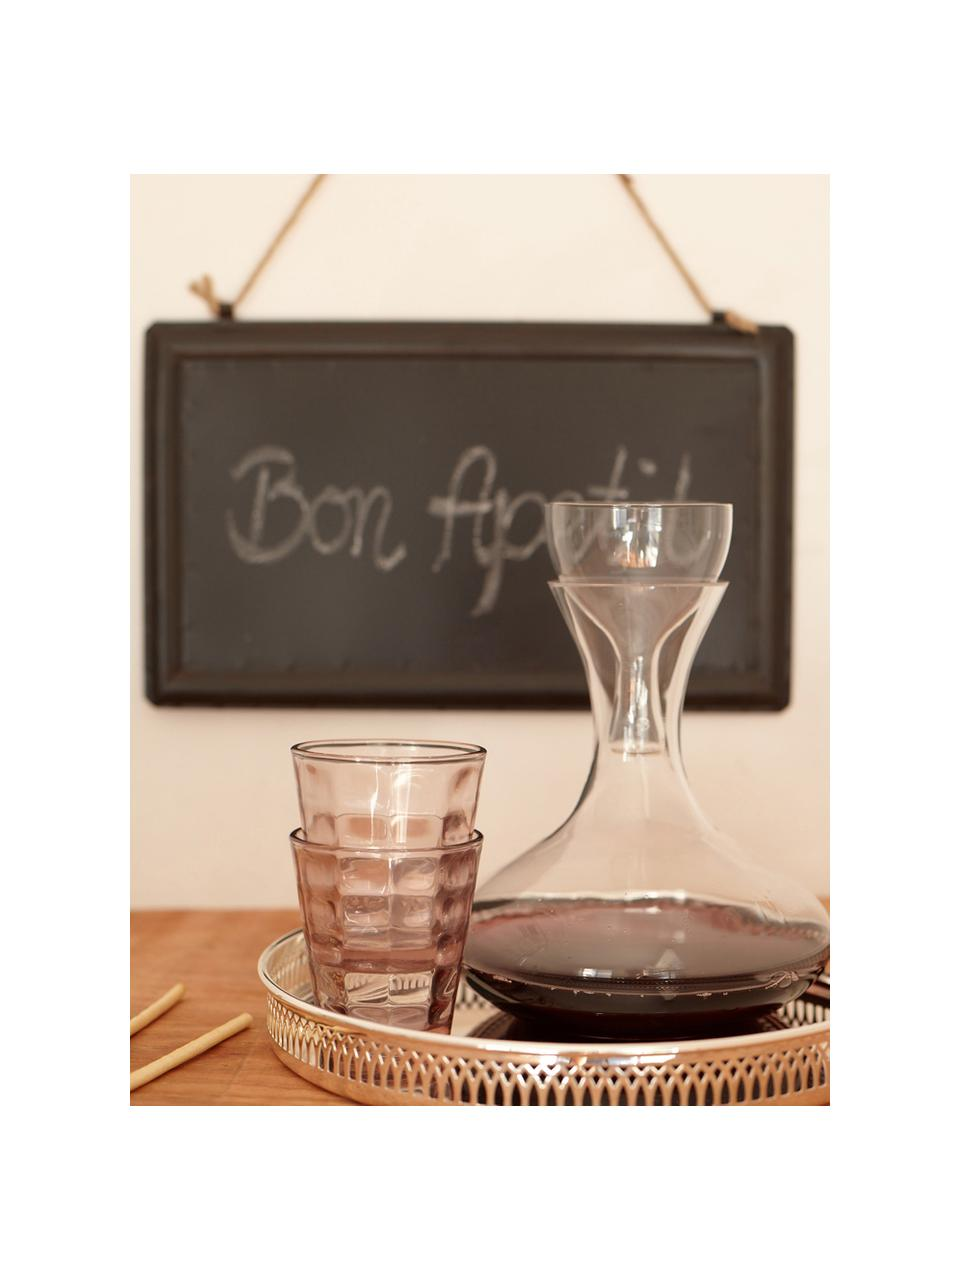 Rotweindekanter Simplicity, 1.85 L, Glas, Transparent, 1.85 L